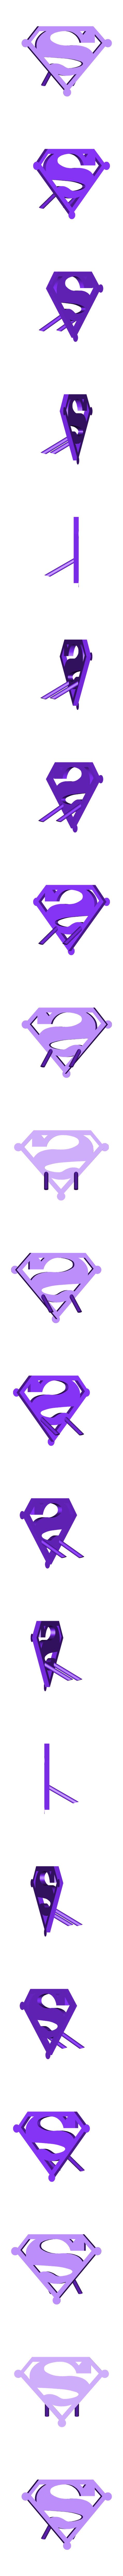 superman 5.stl Download STL file Logo Superman a Poser • 3D printable object, Cybric